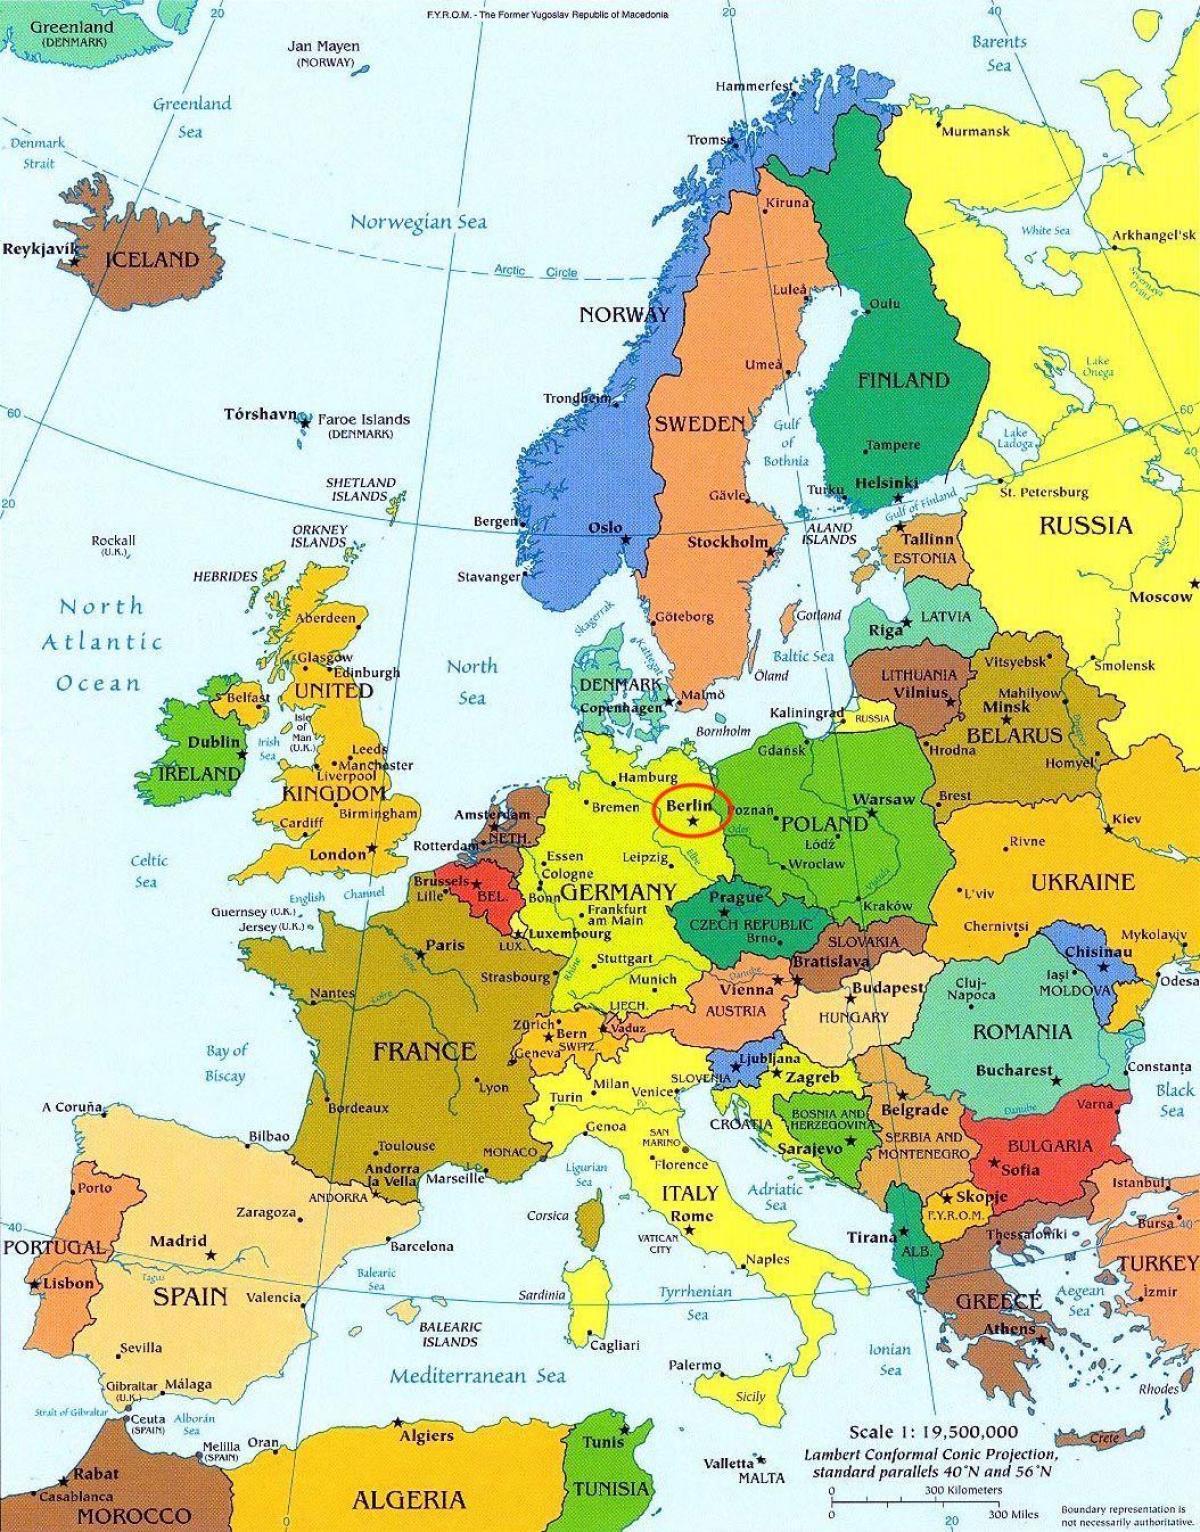 Berlin Harta Europei Harta Berlin Hartă A Europei Germania